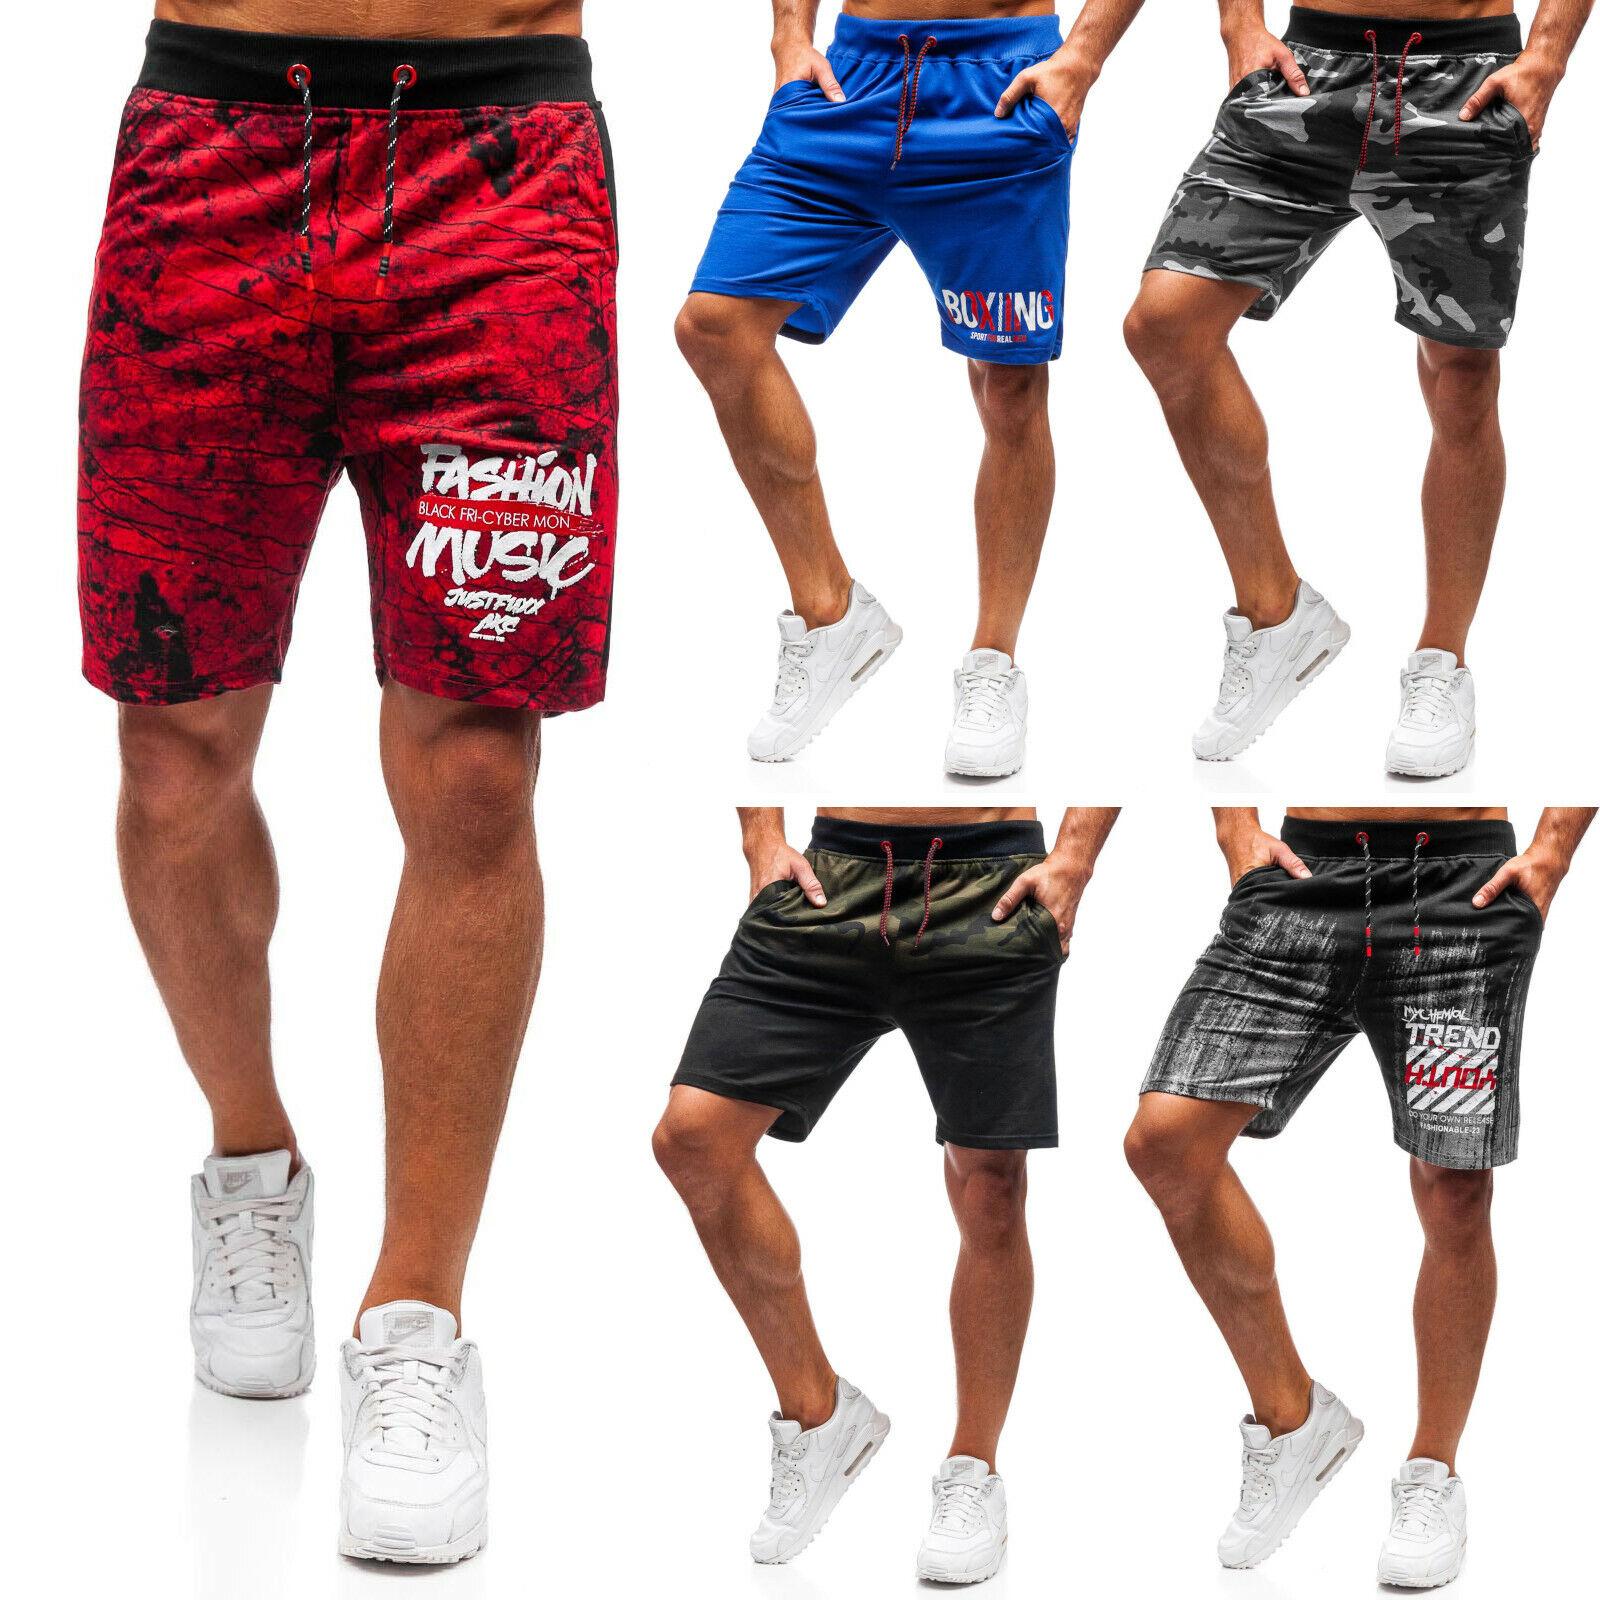 Shorts Kurzhose Trainings Sporthose Bermudas Sport Herren Mix BOLF 7G7 Camo WOW